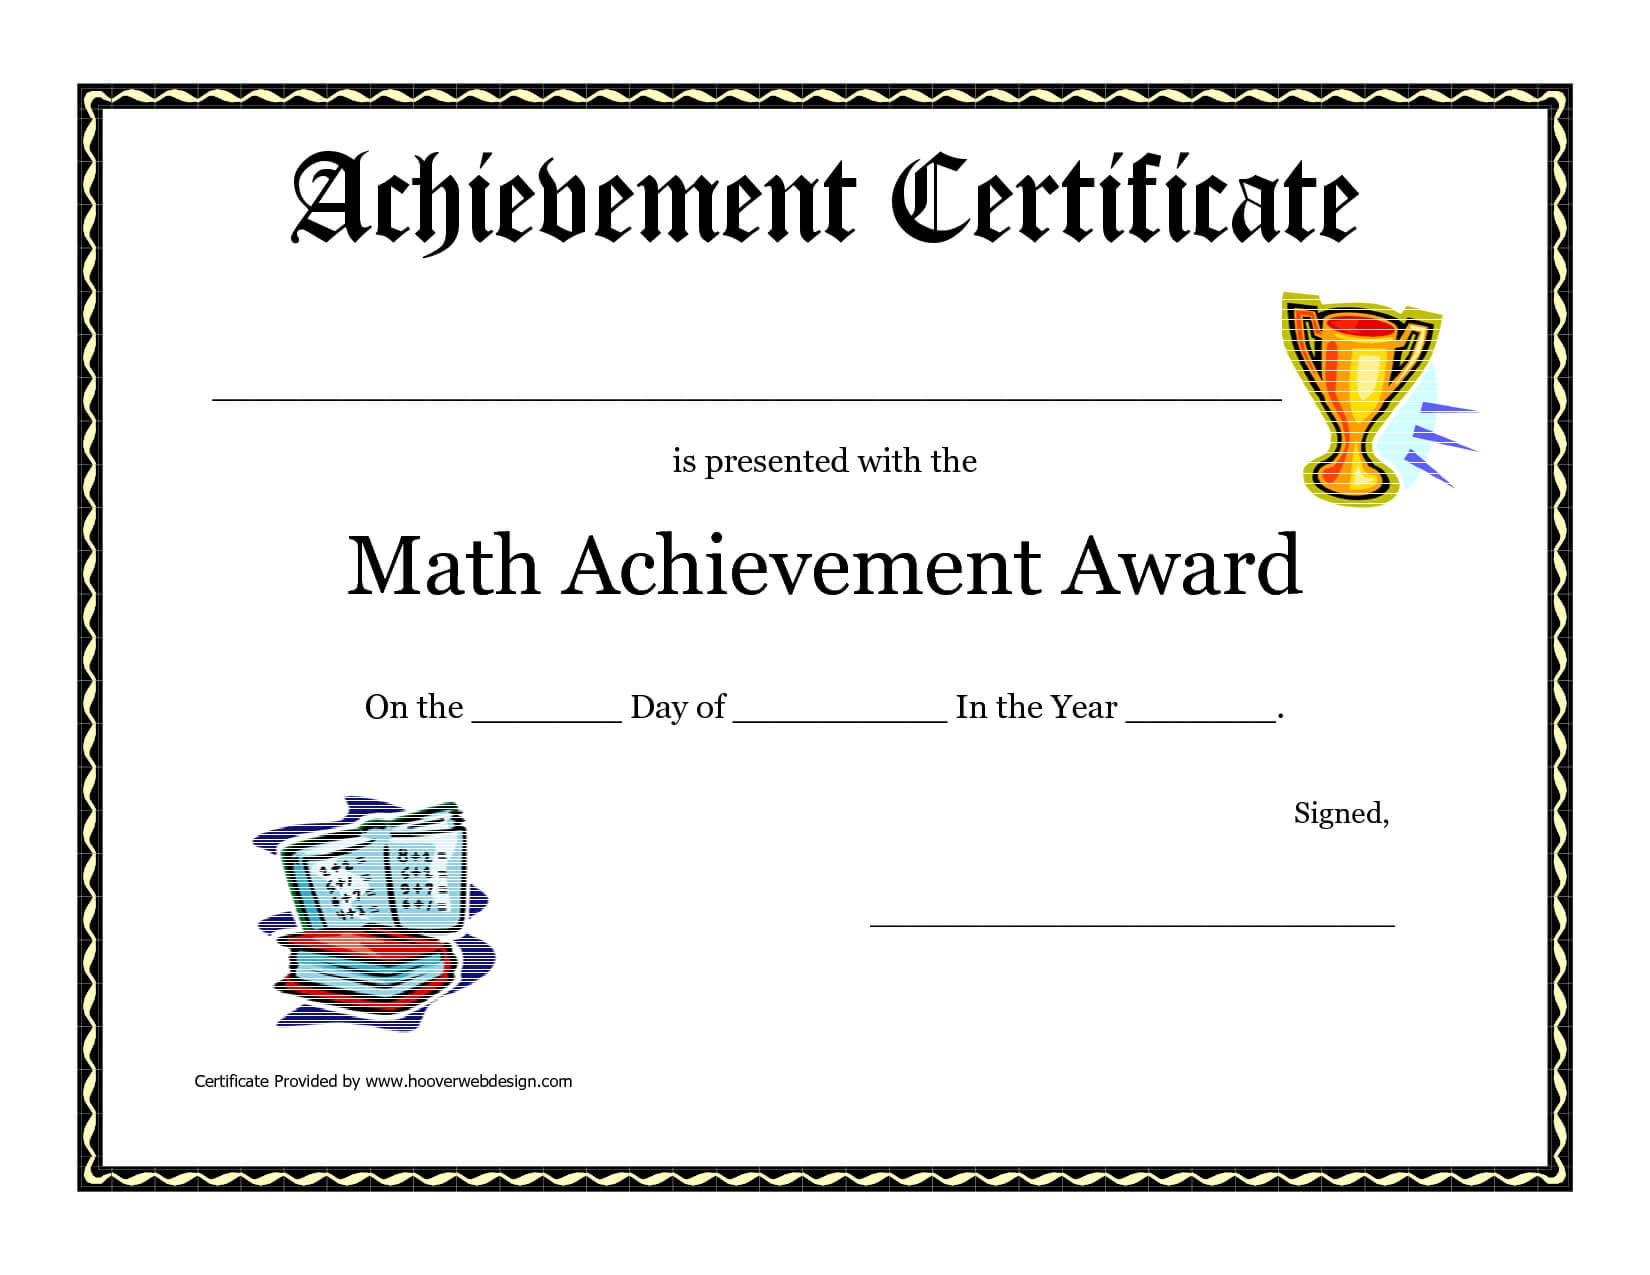 Math Achievement Award Printable Certificate Pdf | Math Regarding Math Certificate Template